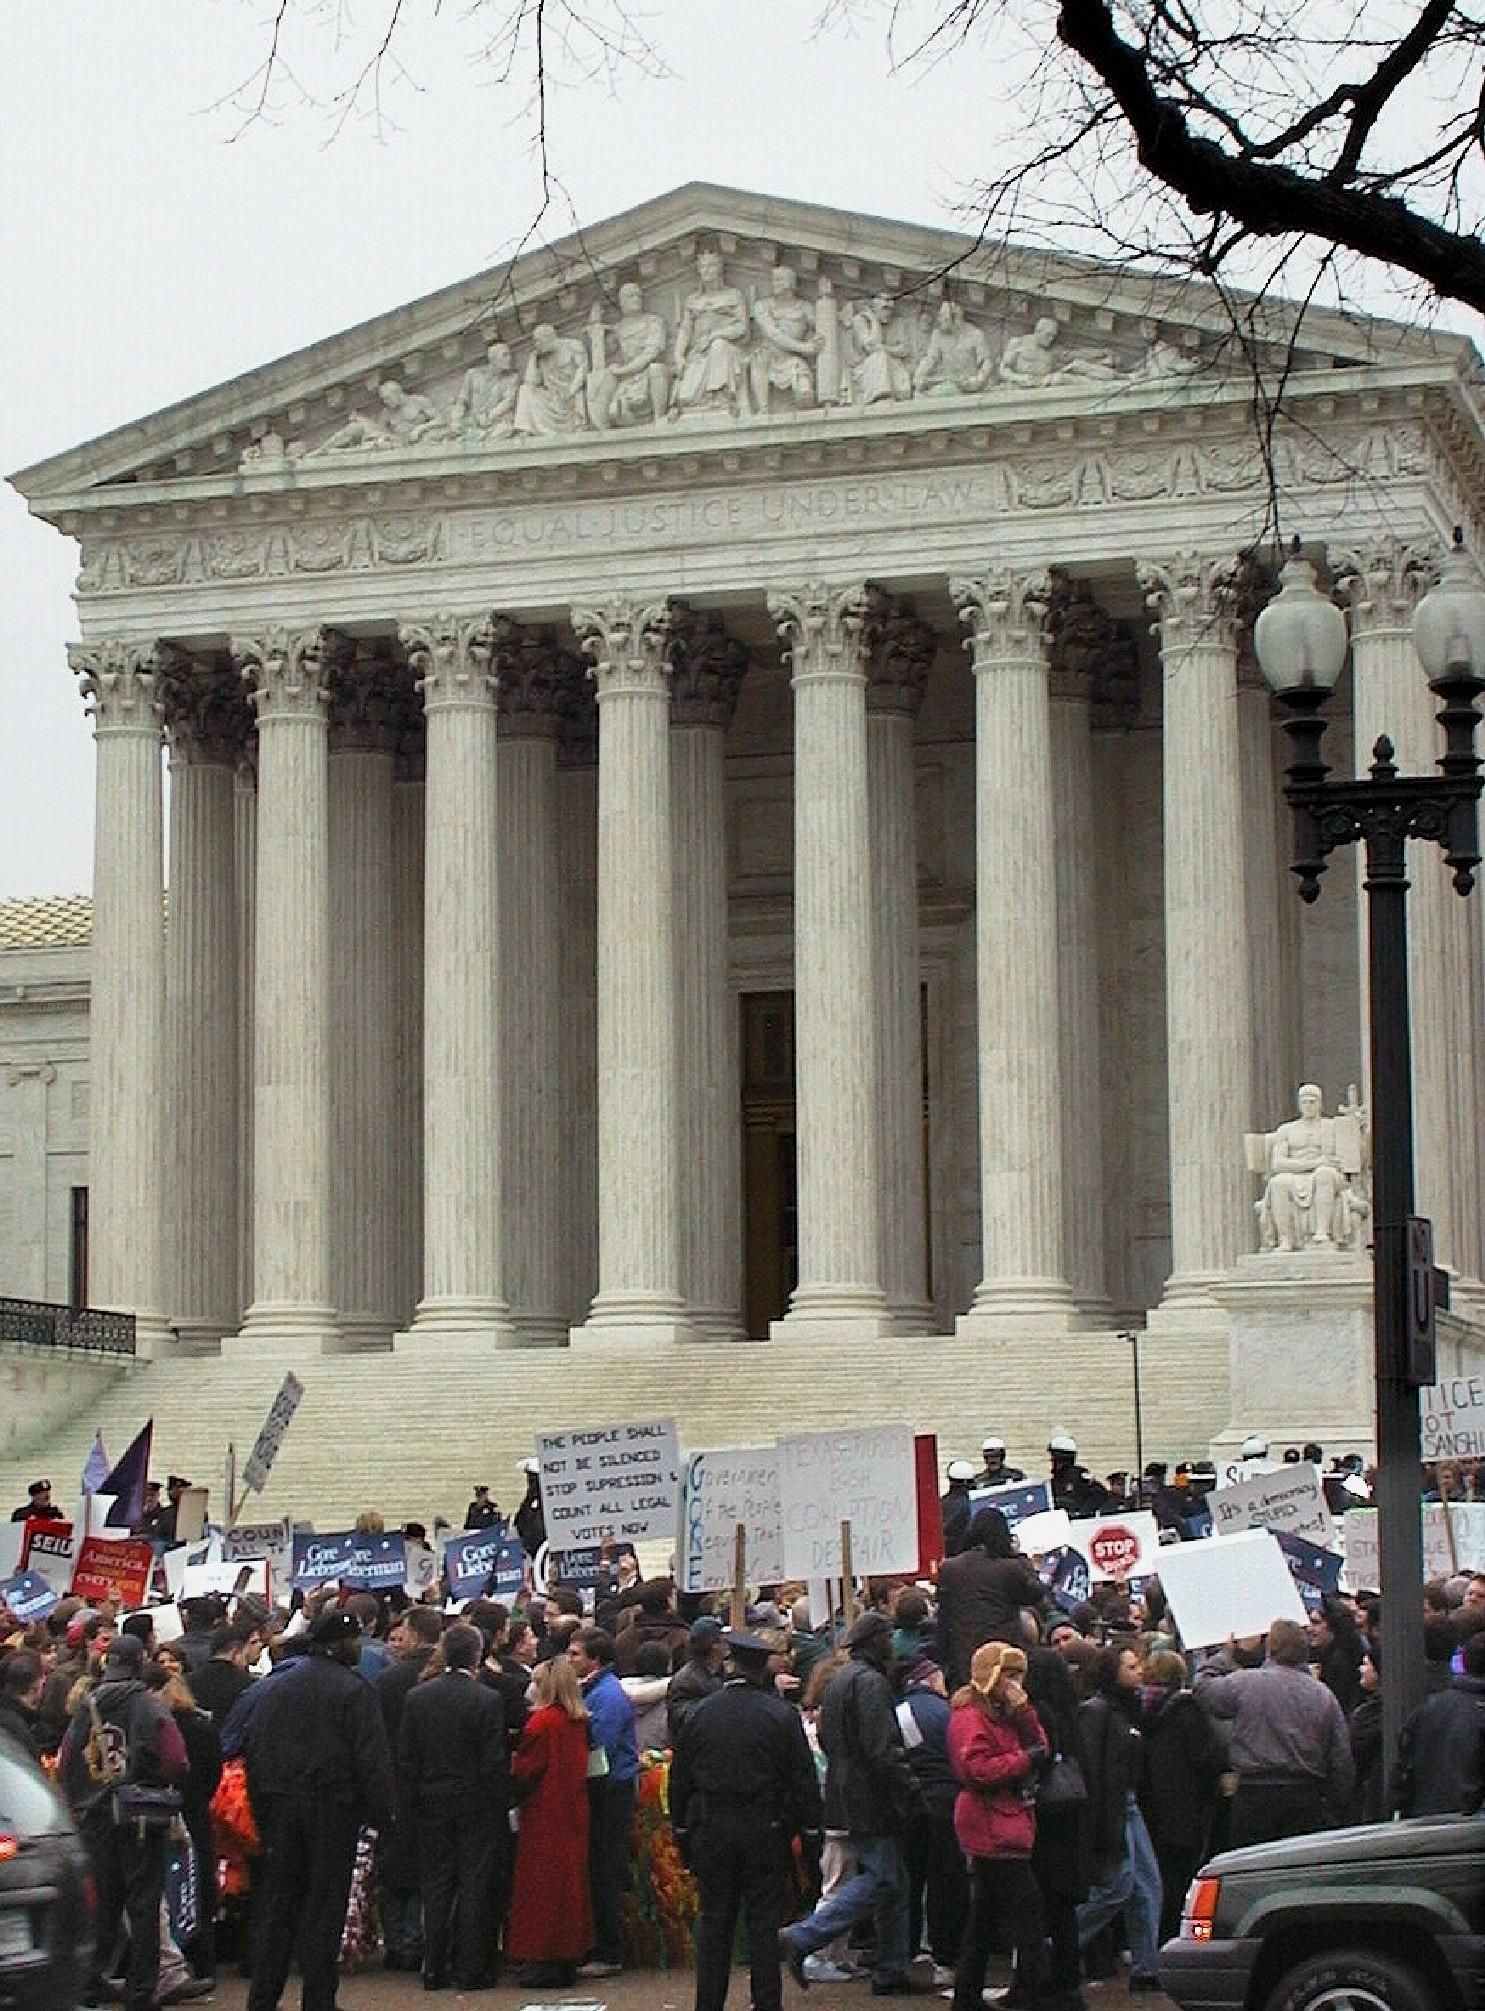 SupremeCourt-Protest-hires.jpg